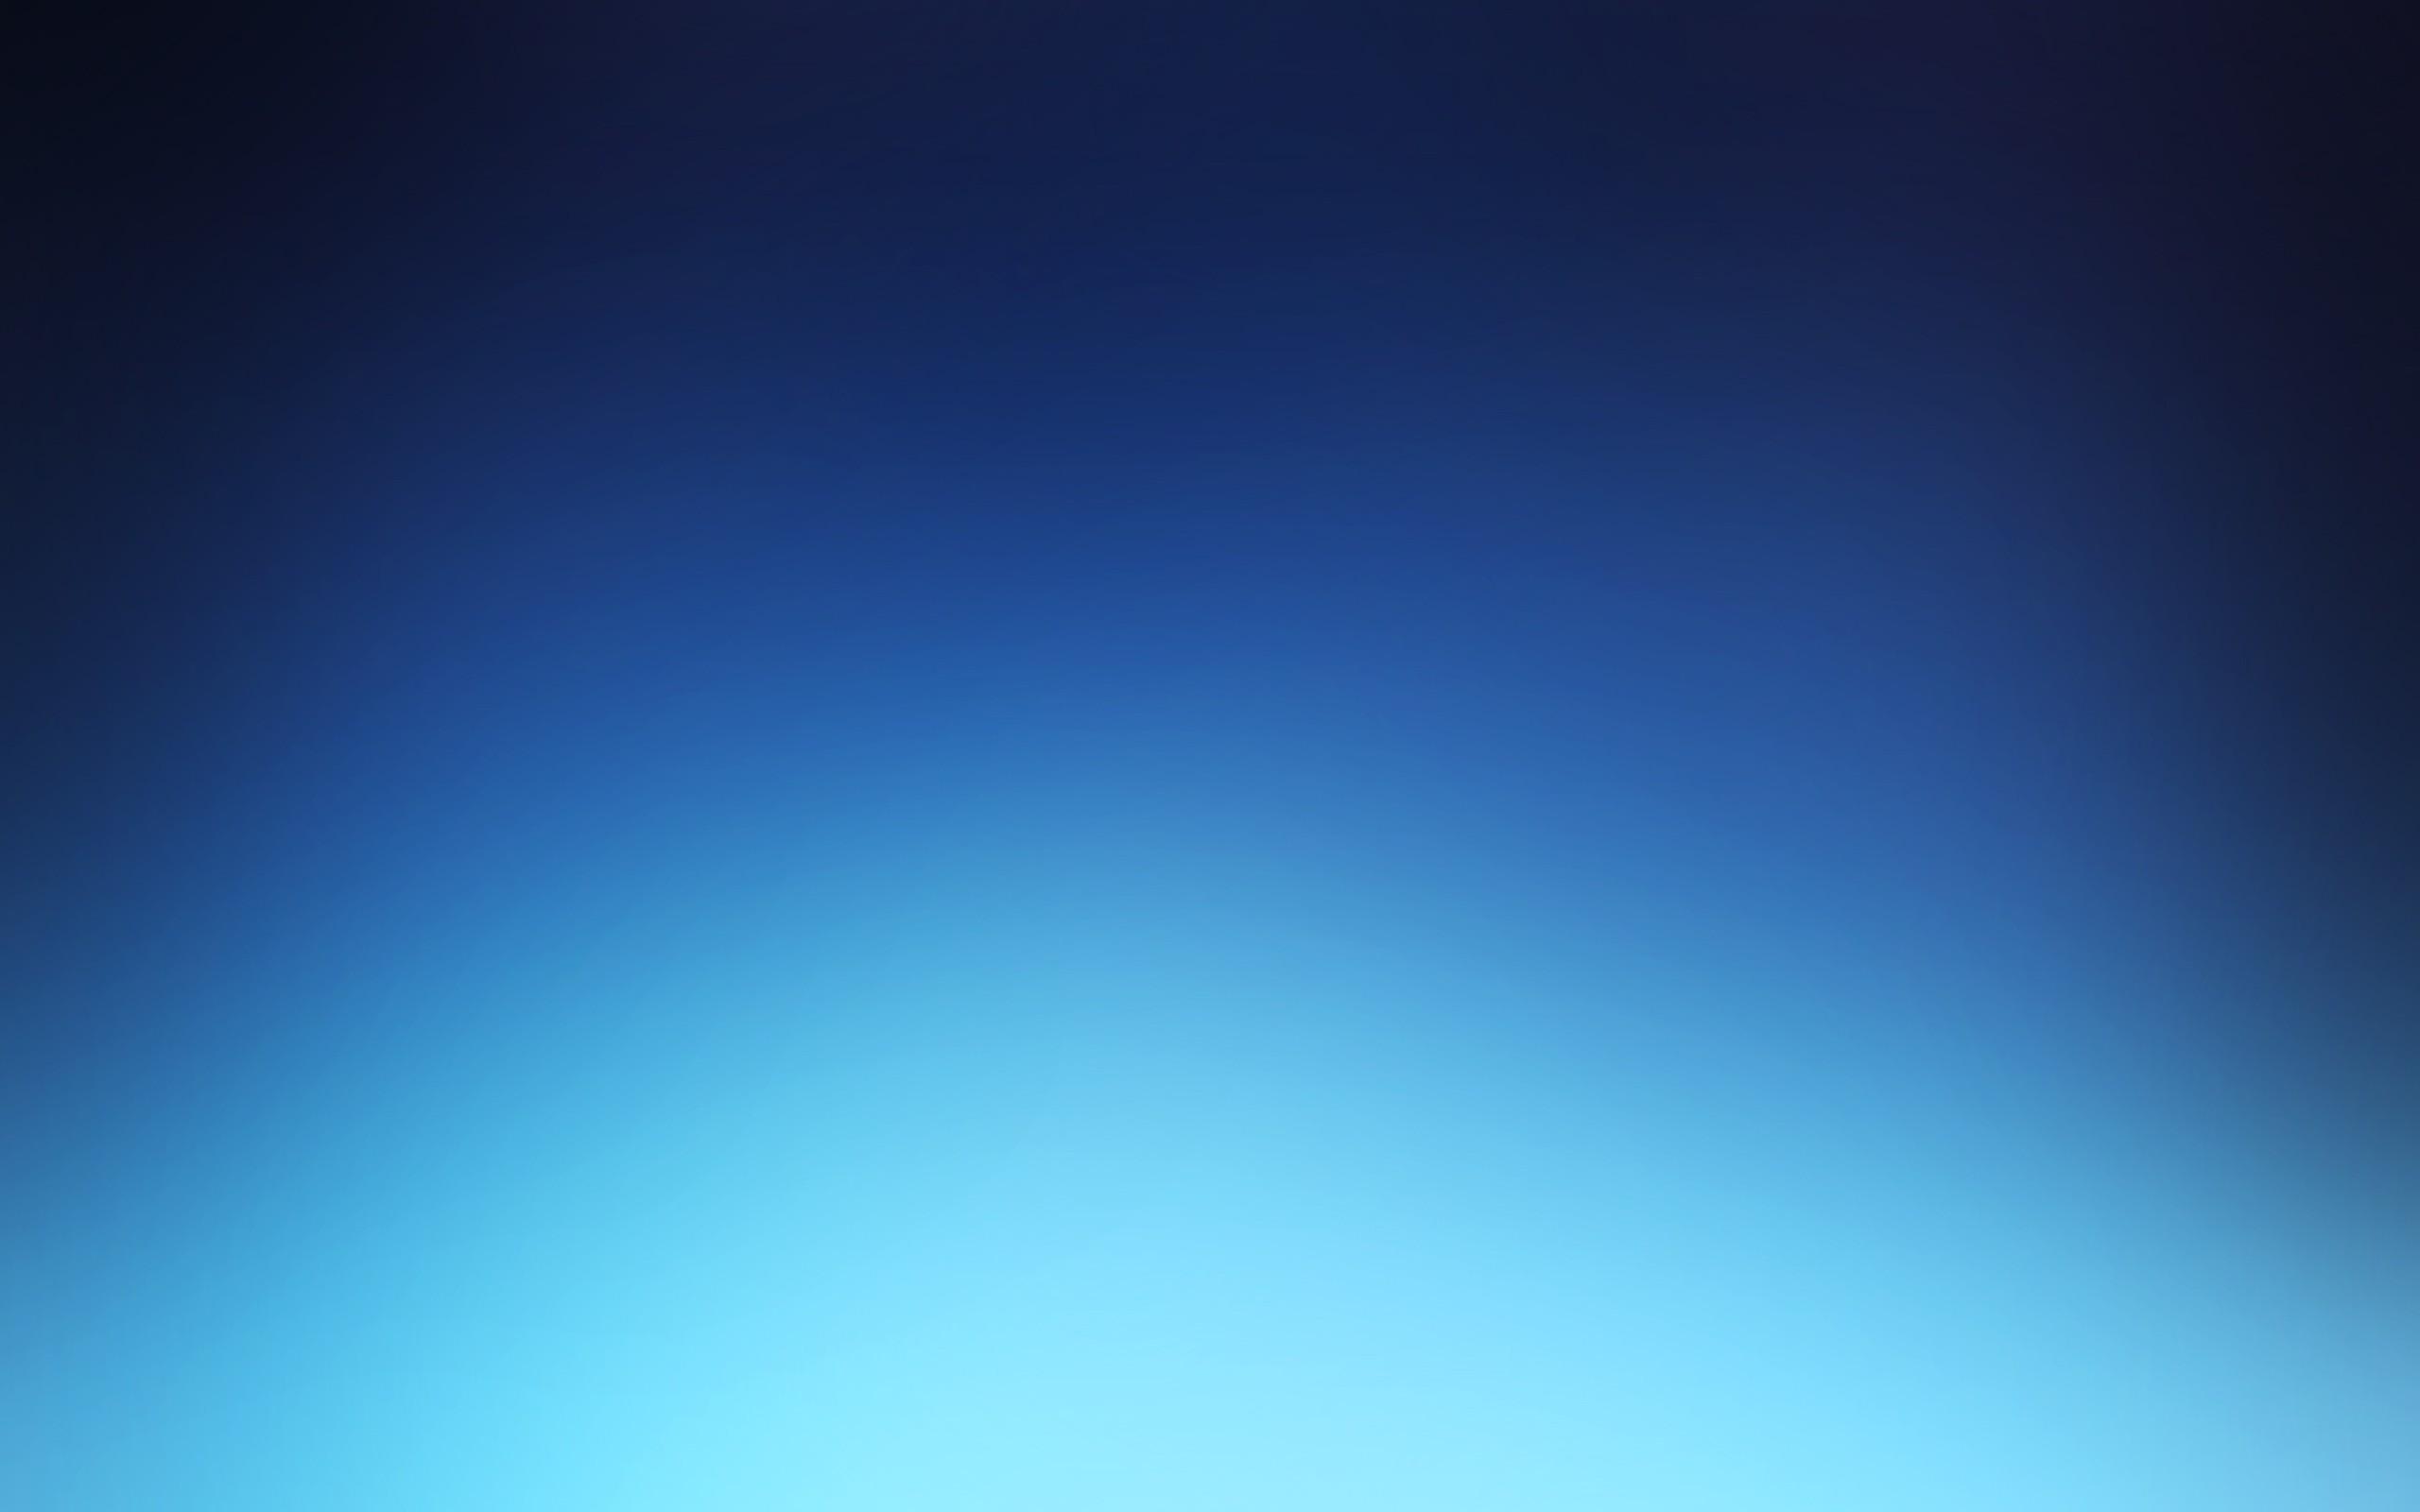 Blue color background wallpaper background 2560x1600